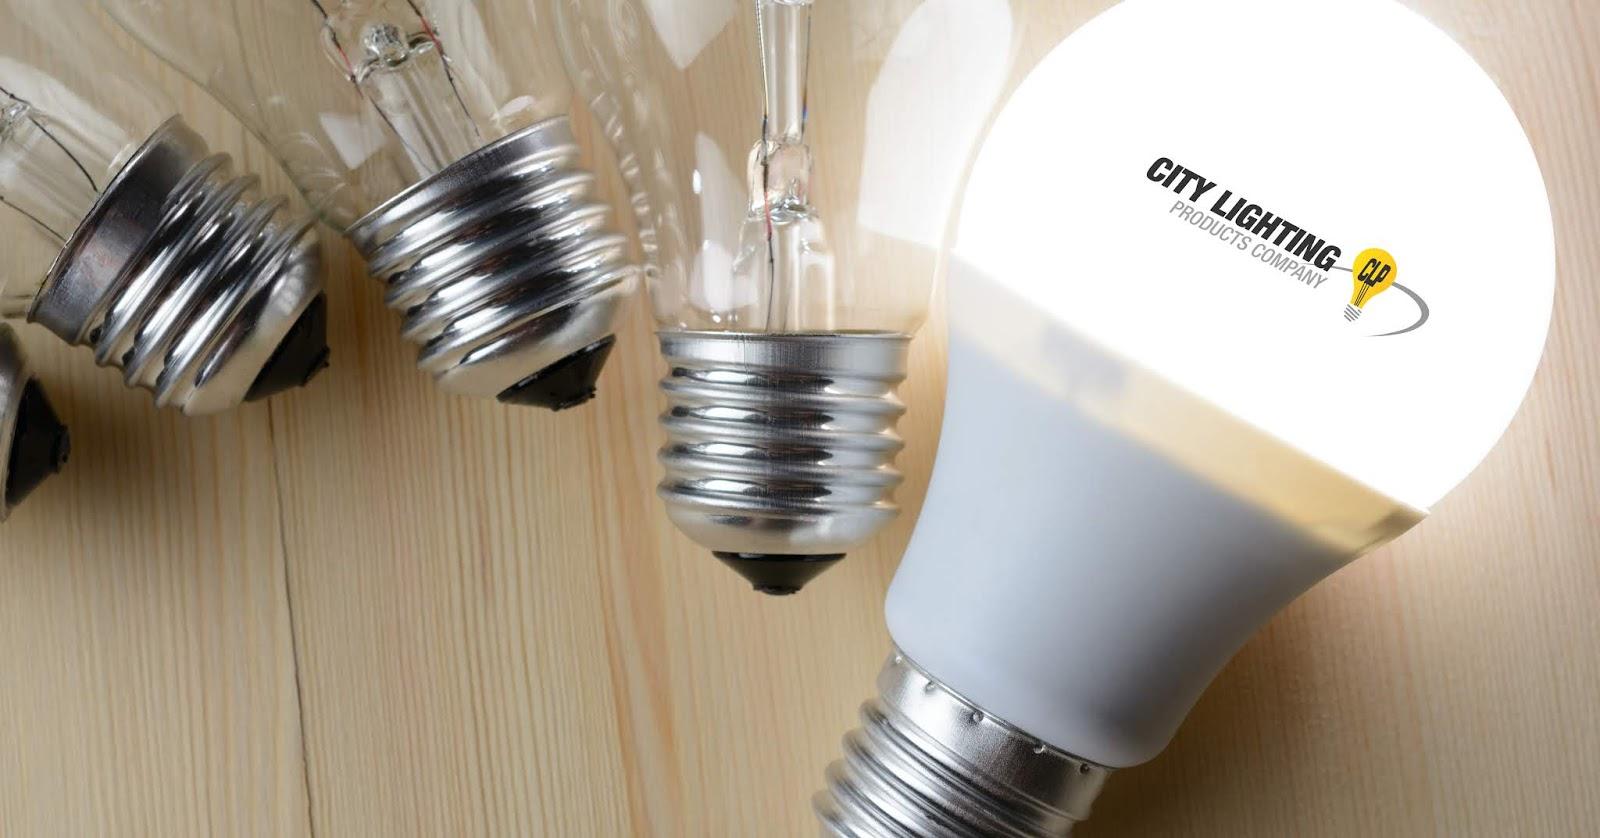 City Lighting Products Blog